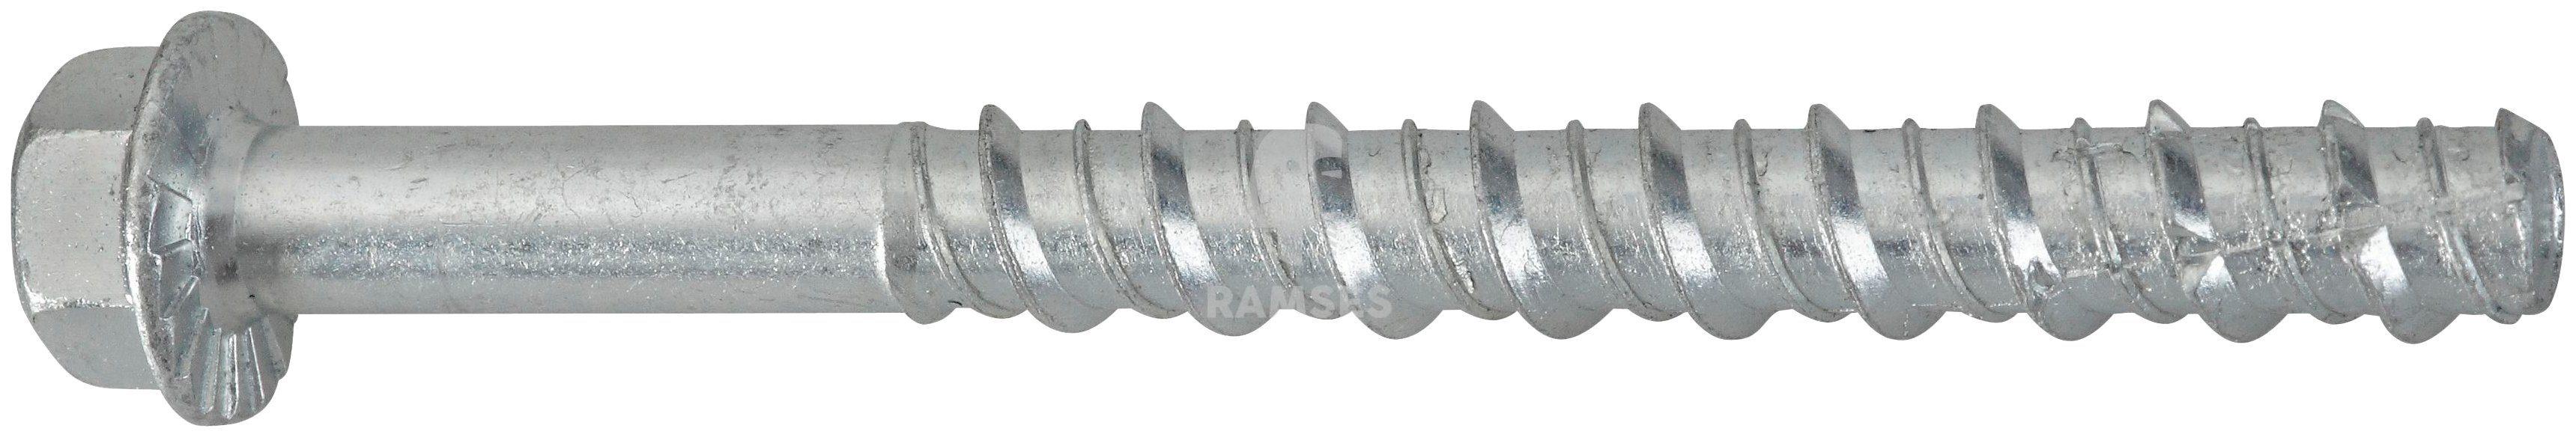 RAMSES Schrauben , Betonschraube 10 x 120 mm25 Stk.